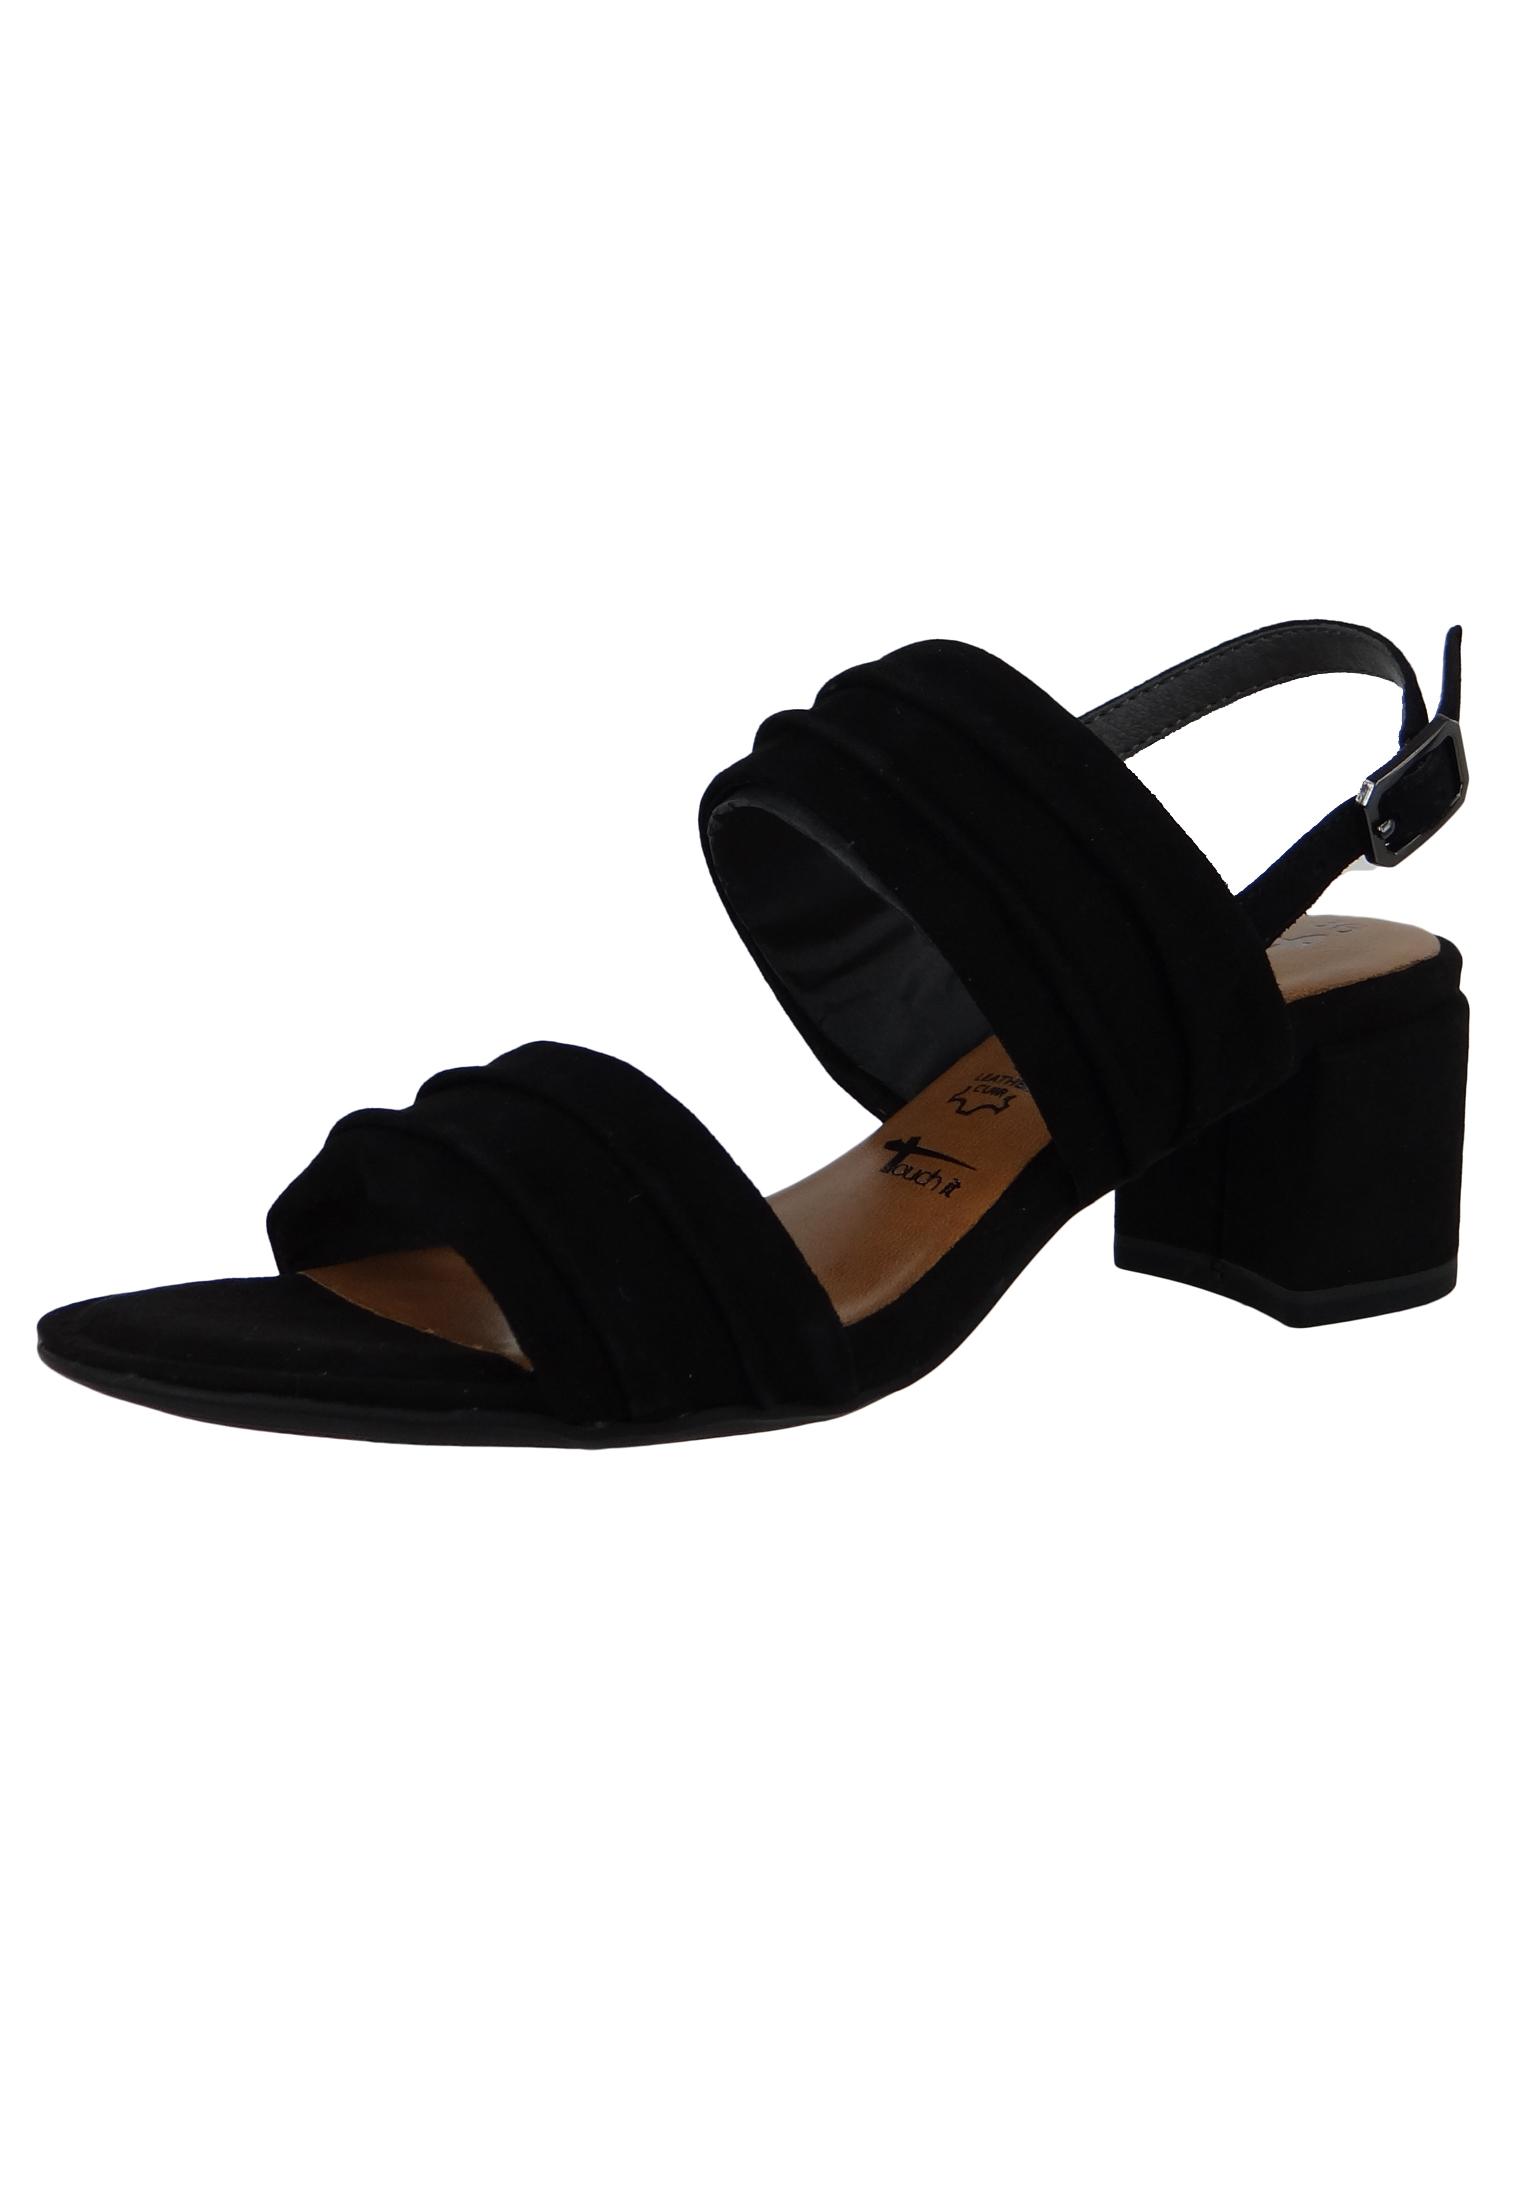 Tamaris 1 28386 22 004 Damen Black Suede Schwarz Sandale Sandalette mit TOUCH IT Sohle